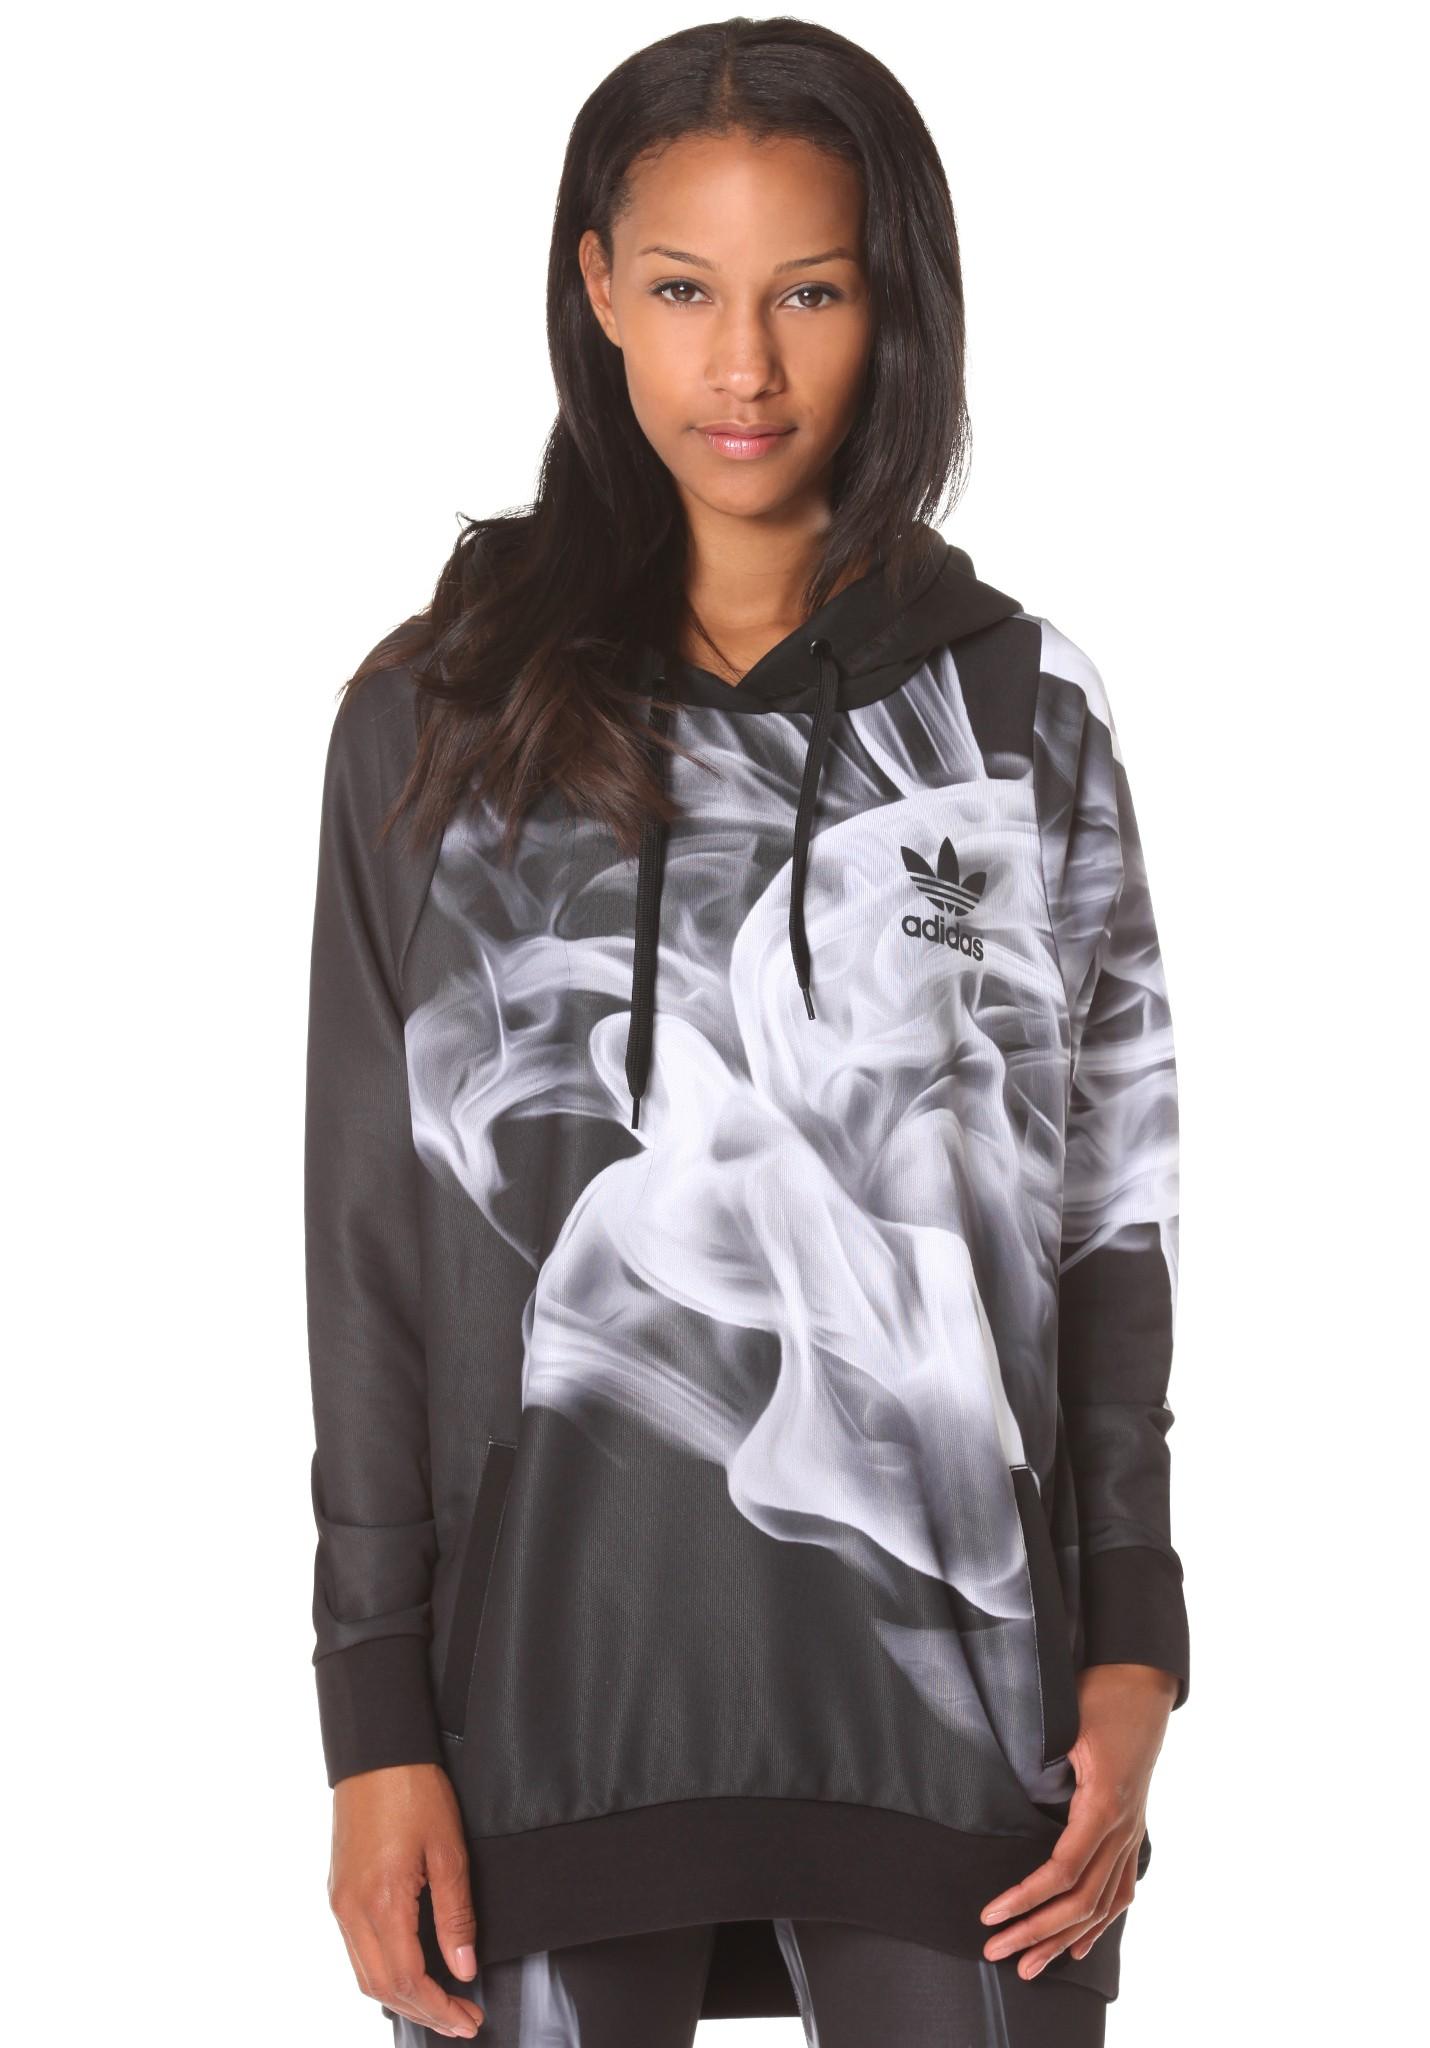 neu adidas smoke damen kapuzenpullover pullover hoodie. Black Bedroom Furniture Sets. Home Design Ideas